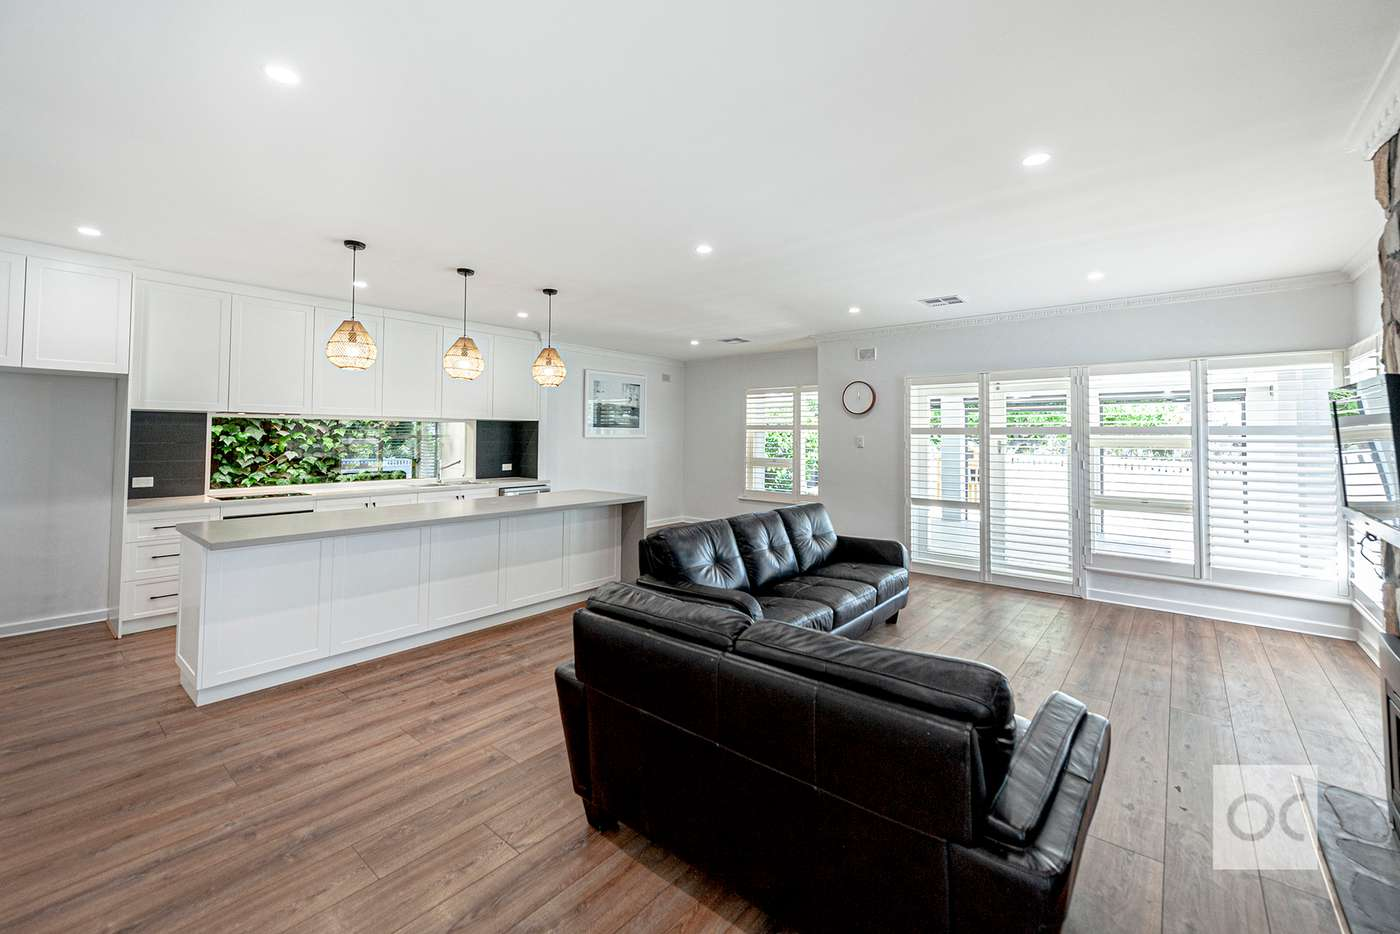 Sixth view of Homely house listing, 1 Florida Court, Panorama SA 5041